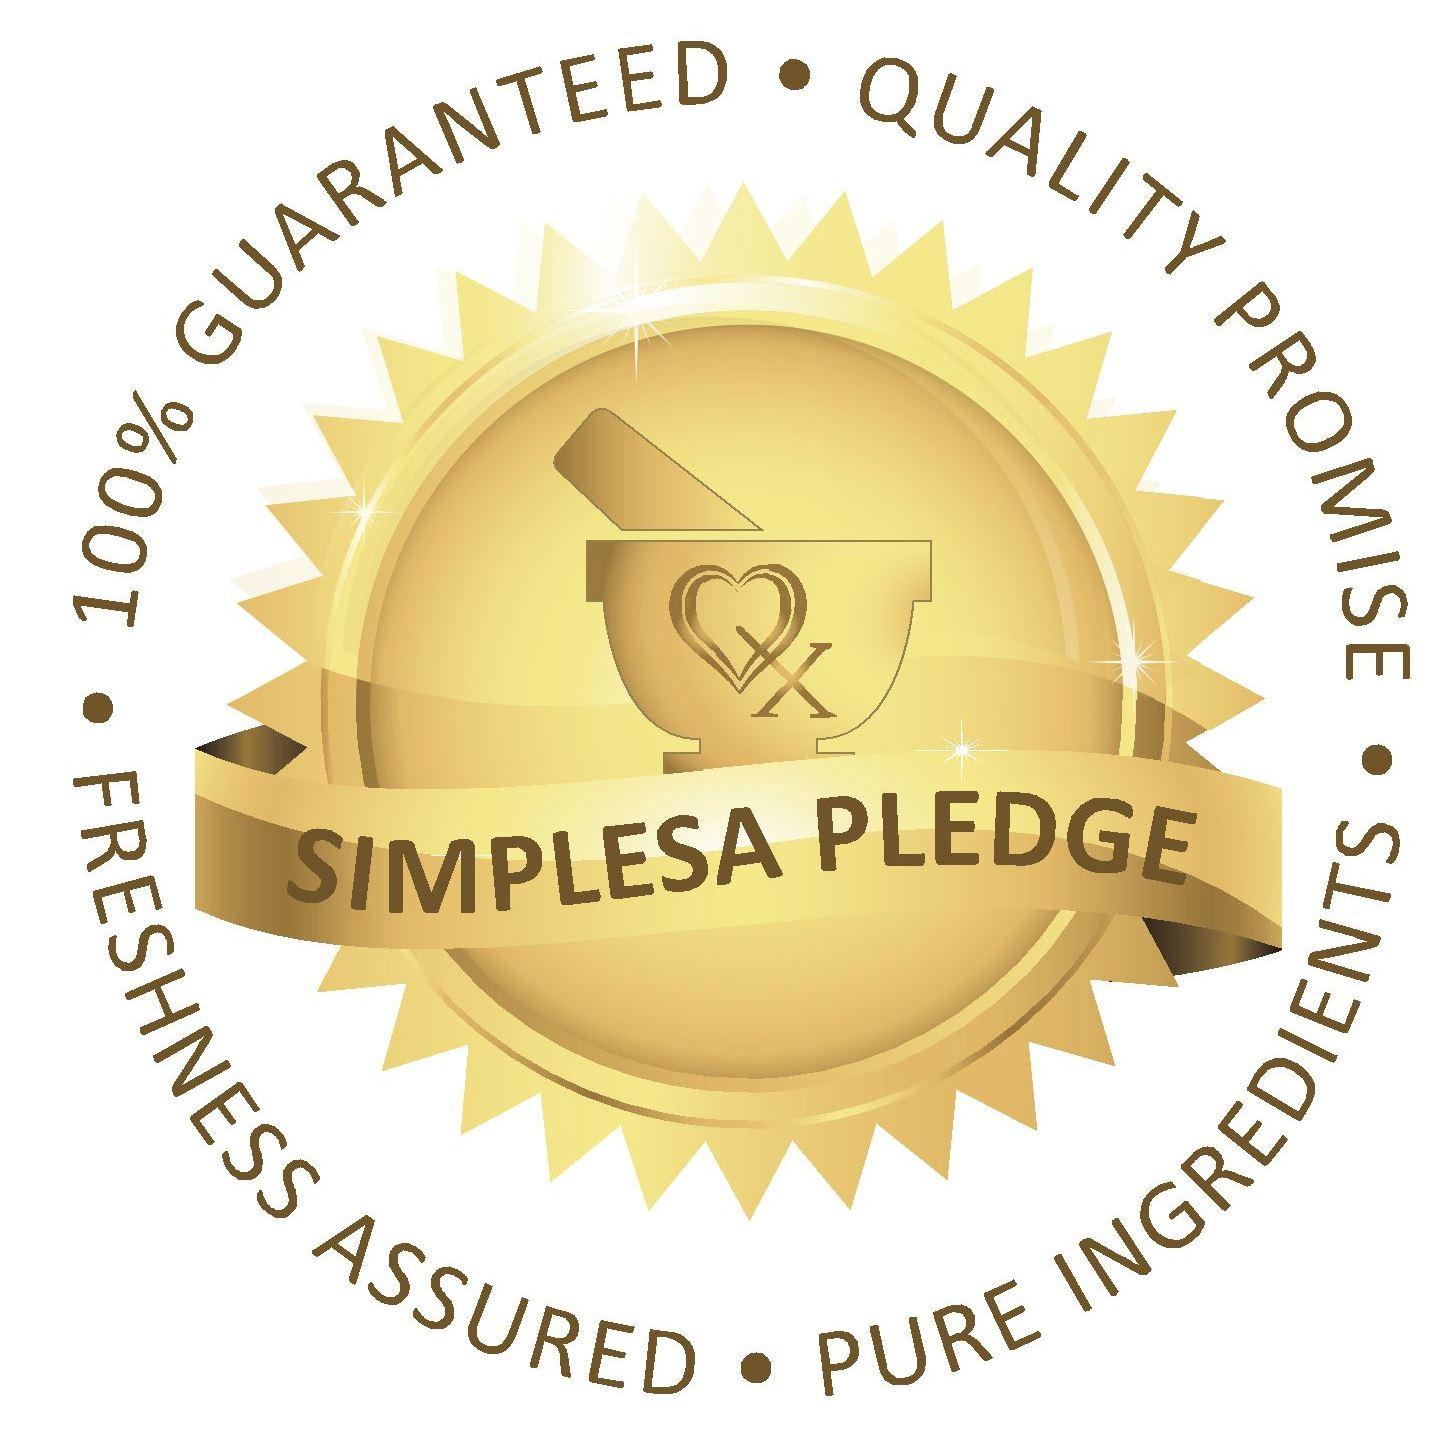 Simplesa Quality Promise